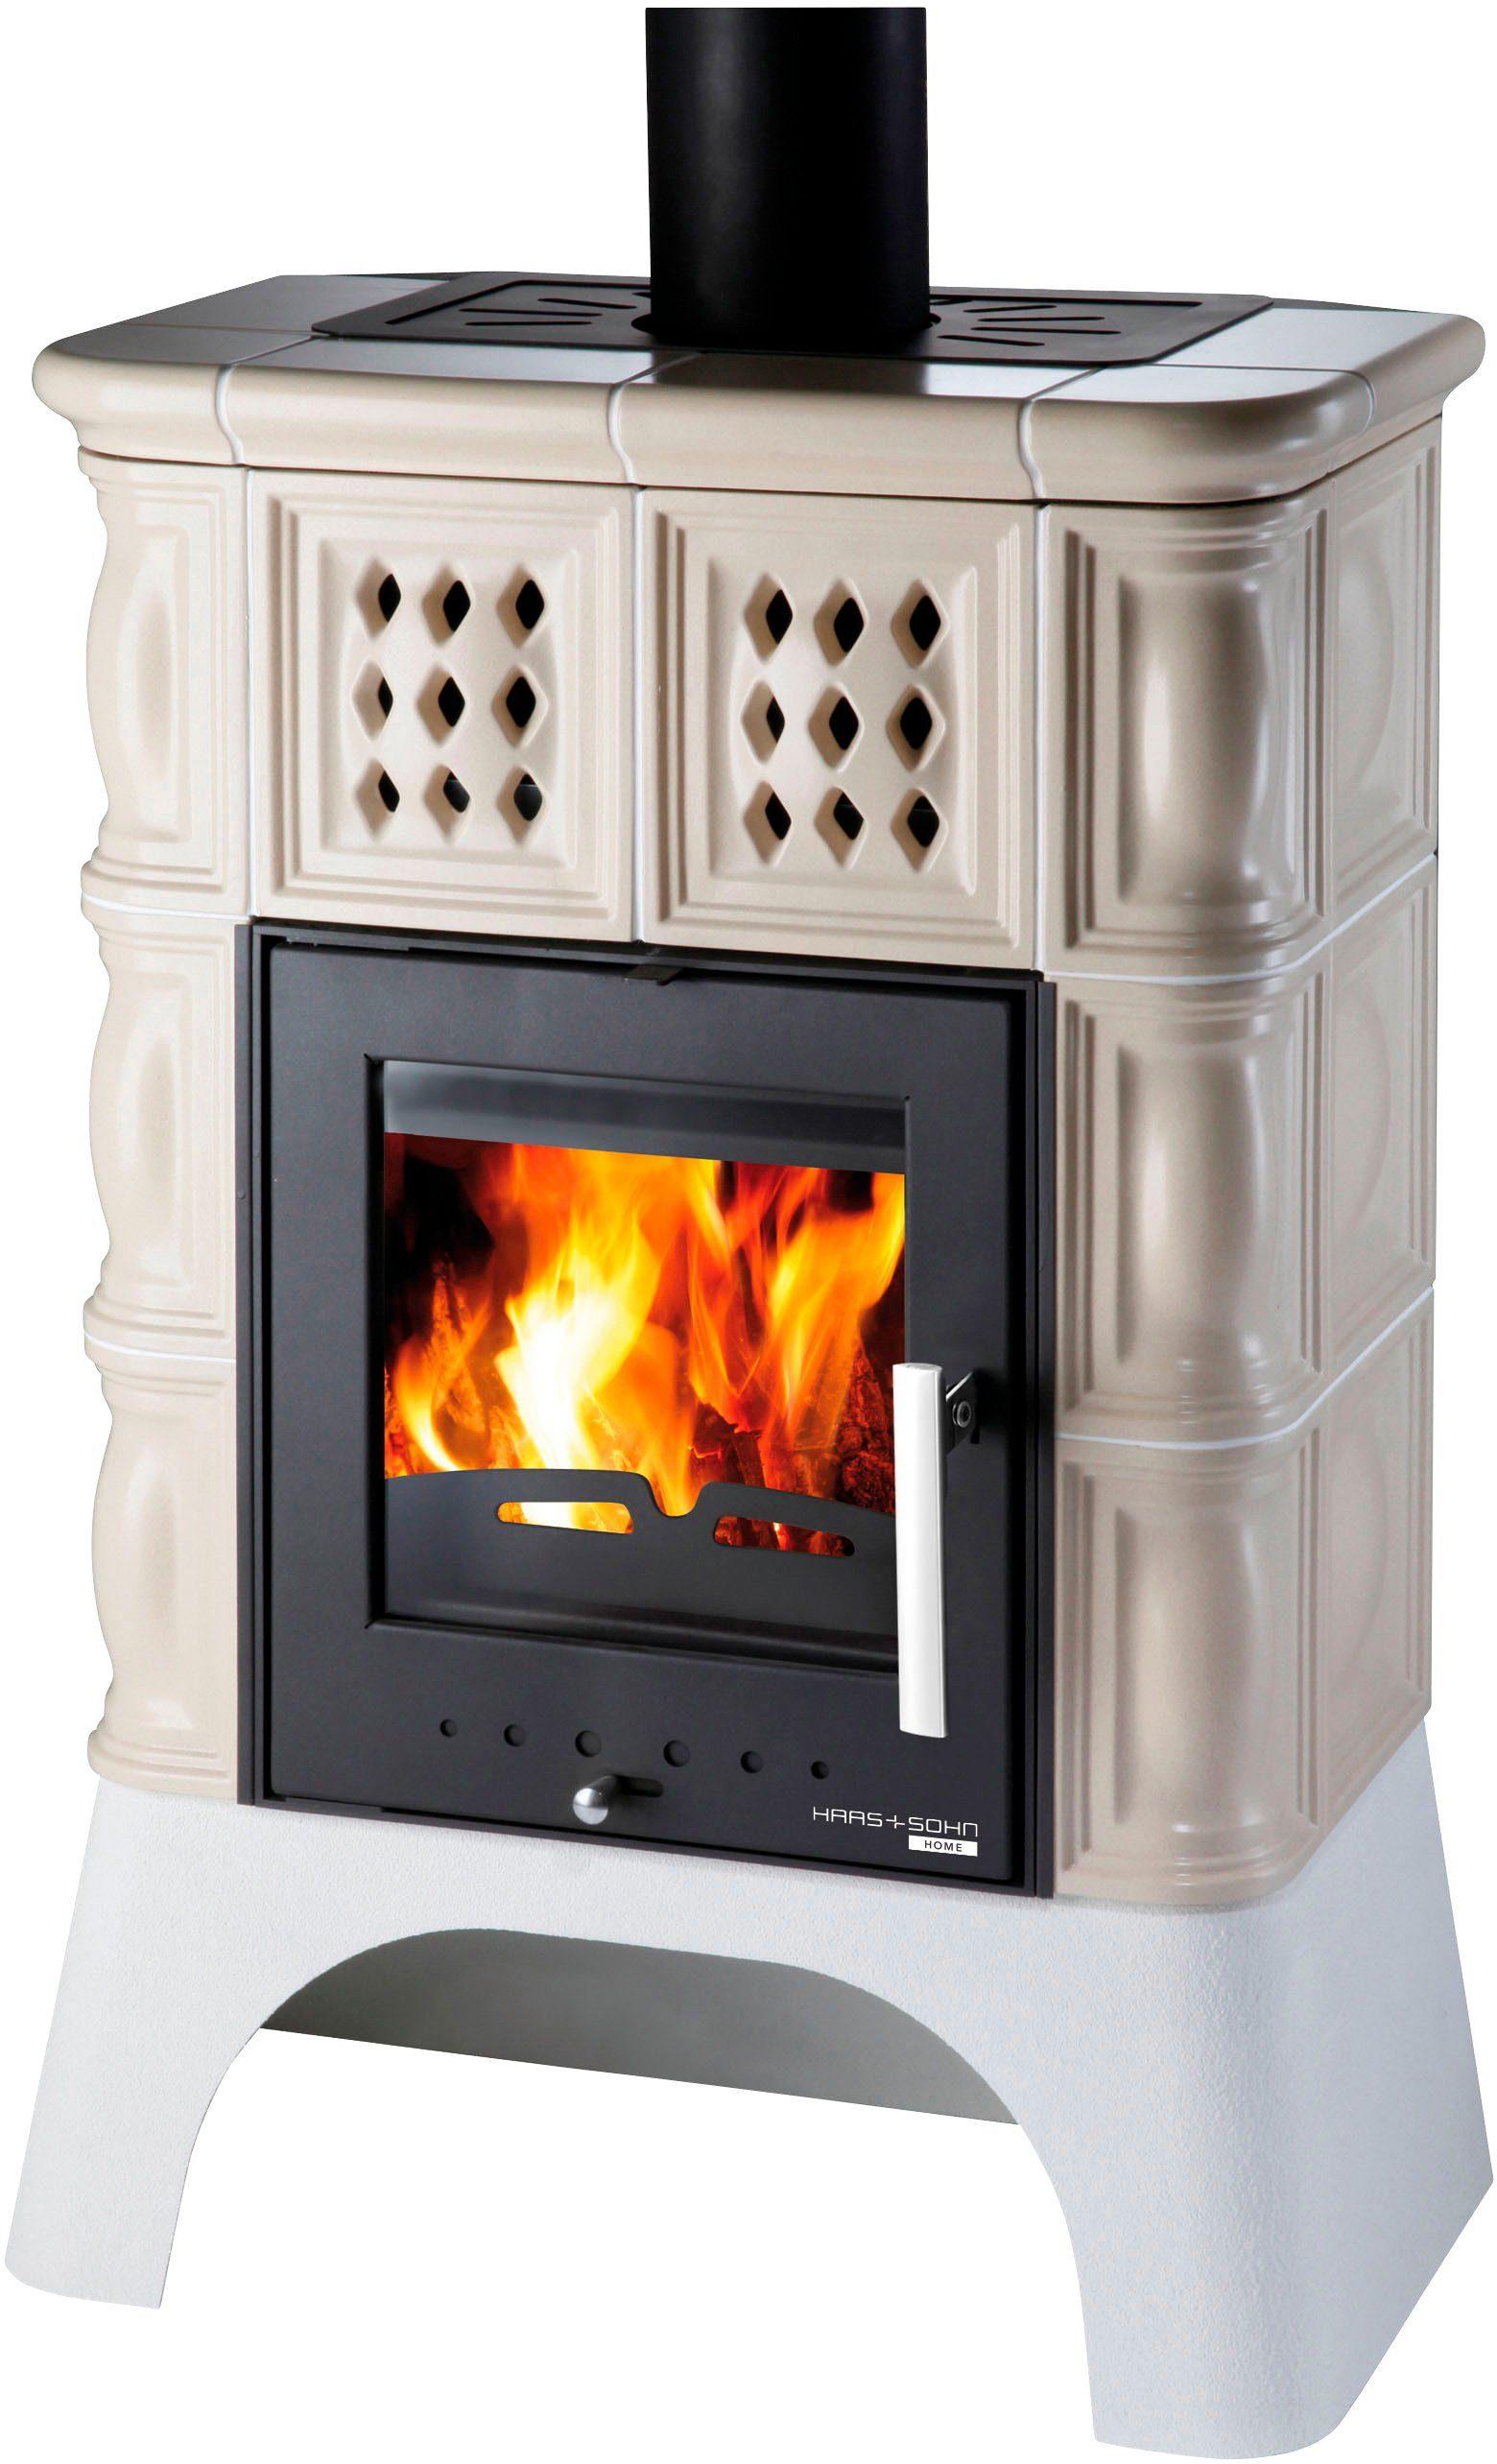 HAAS+SOHN Kaminofen »TREVISO II 339.15 perl-schwarz/creme«, Stahl, 8 kW, weißer Sockel